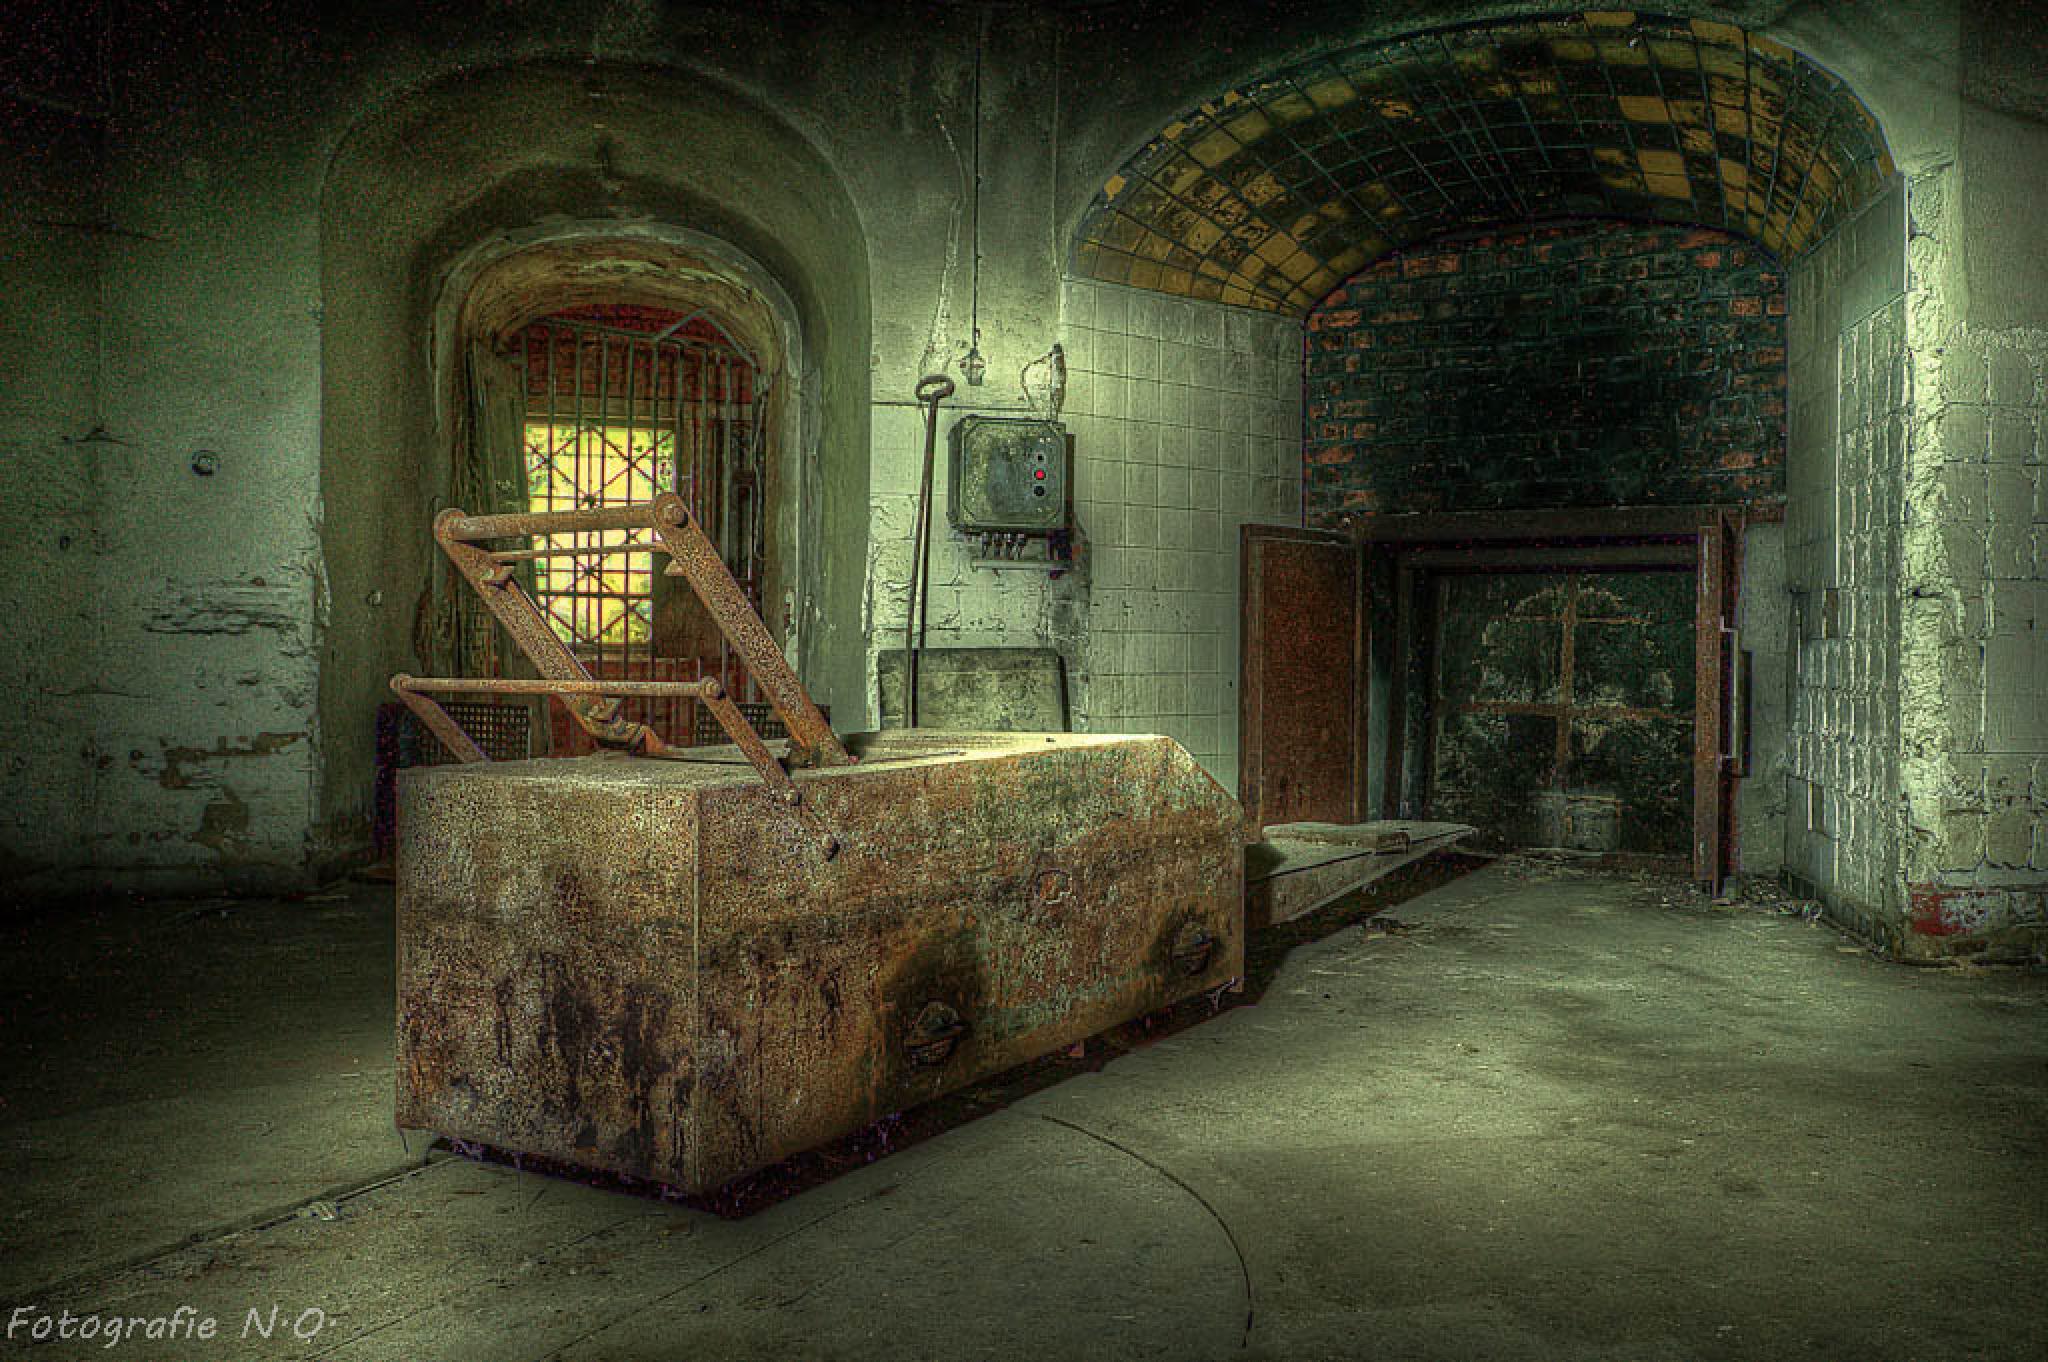 Krematorium by nicole.opitz.100